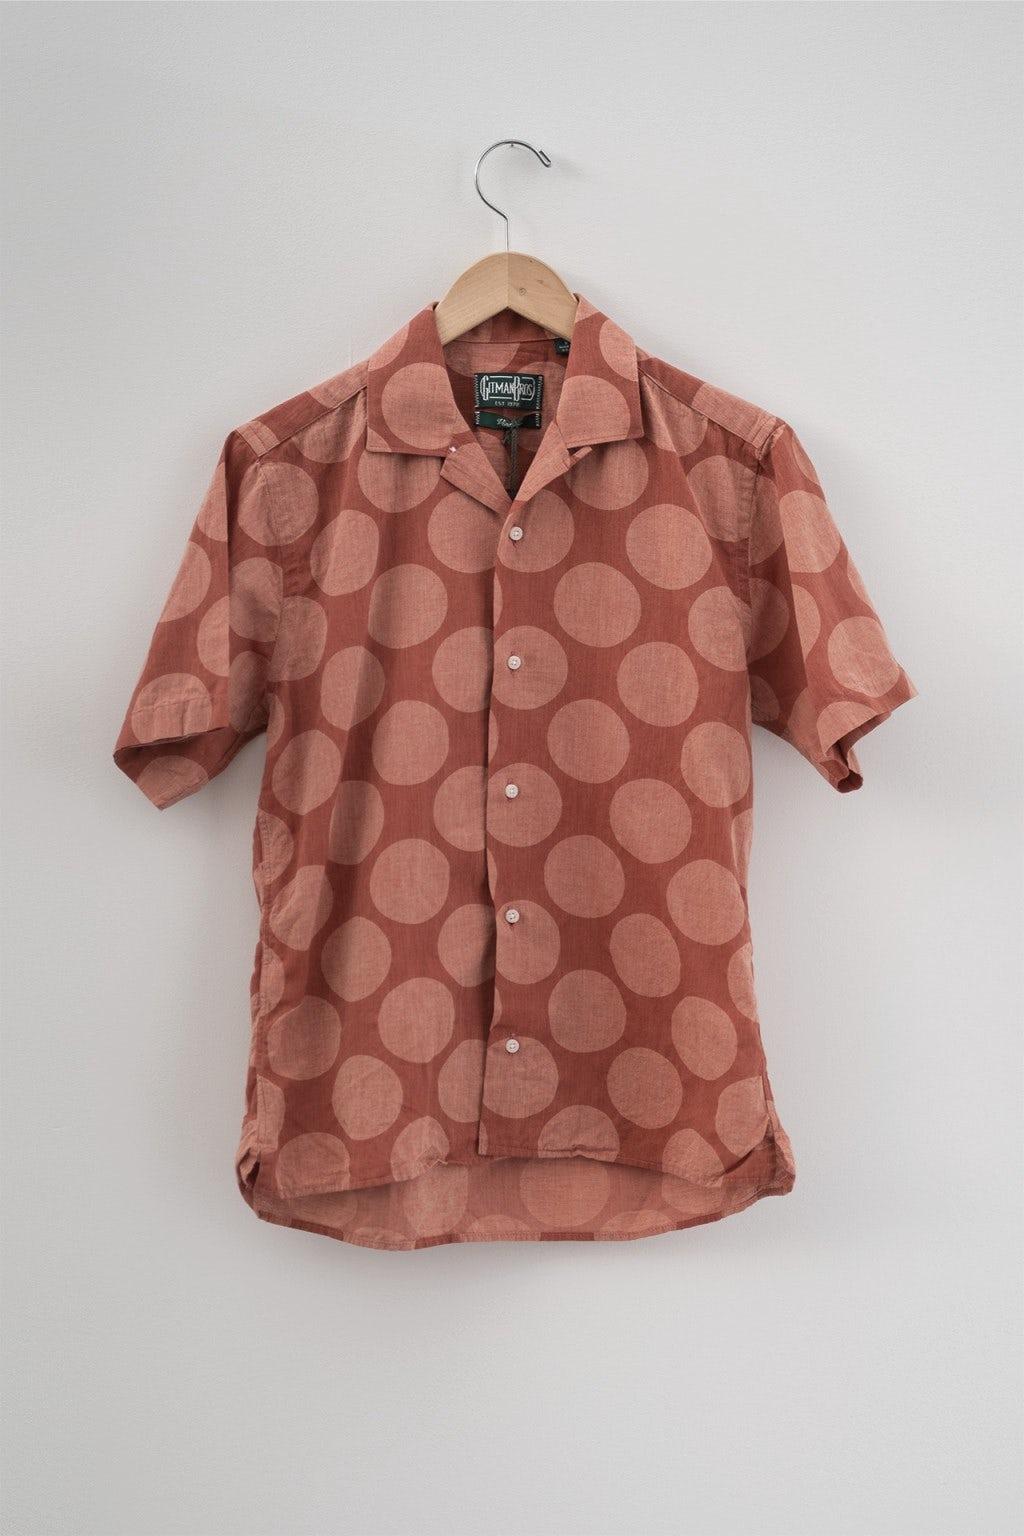 Gitman Bros. Vintage Camp Shirt Brick Dot